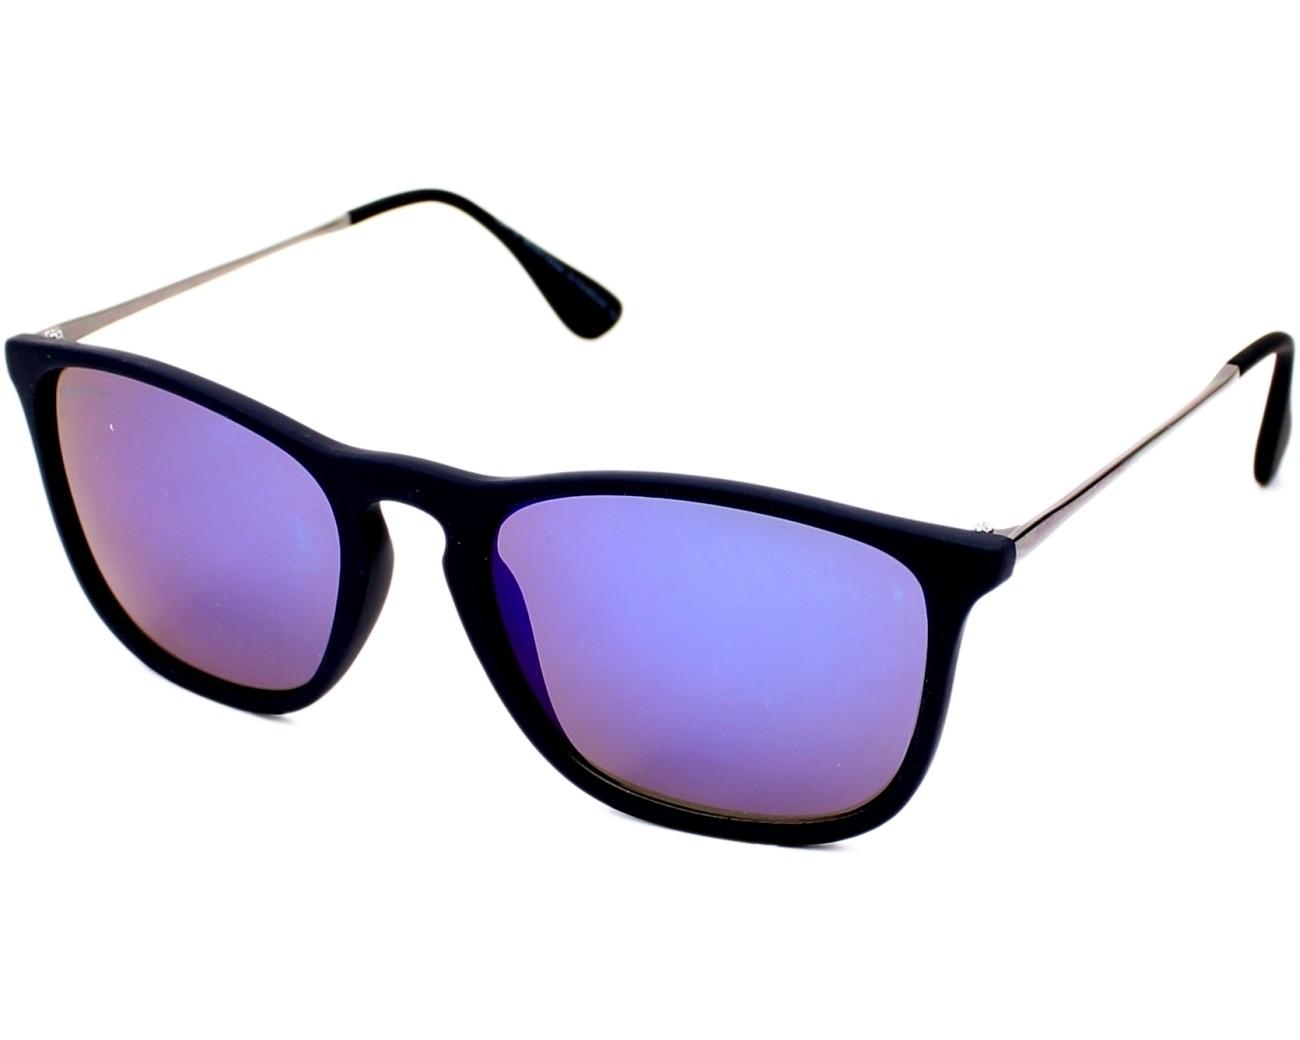 Montana Eyewear MS34-Schwarz-Silber ZhccvxqT